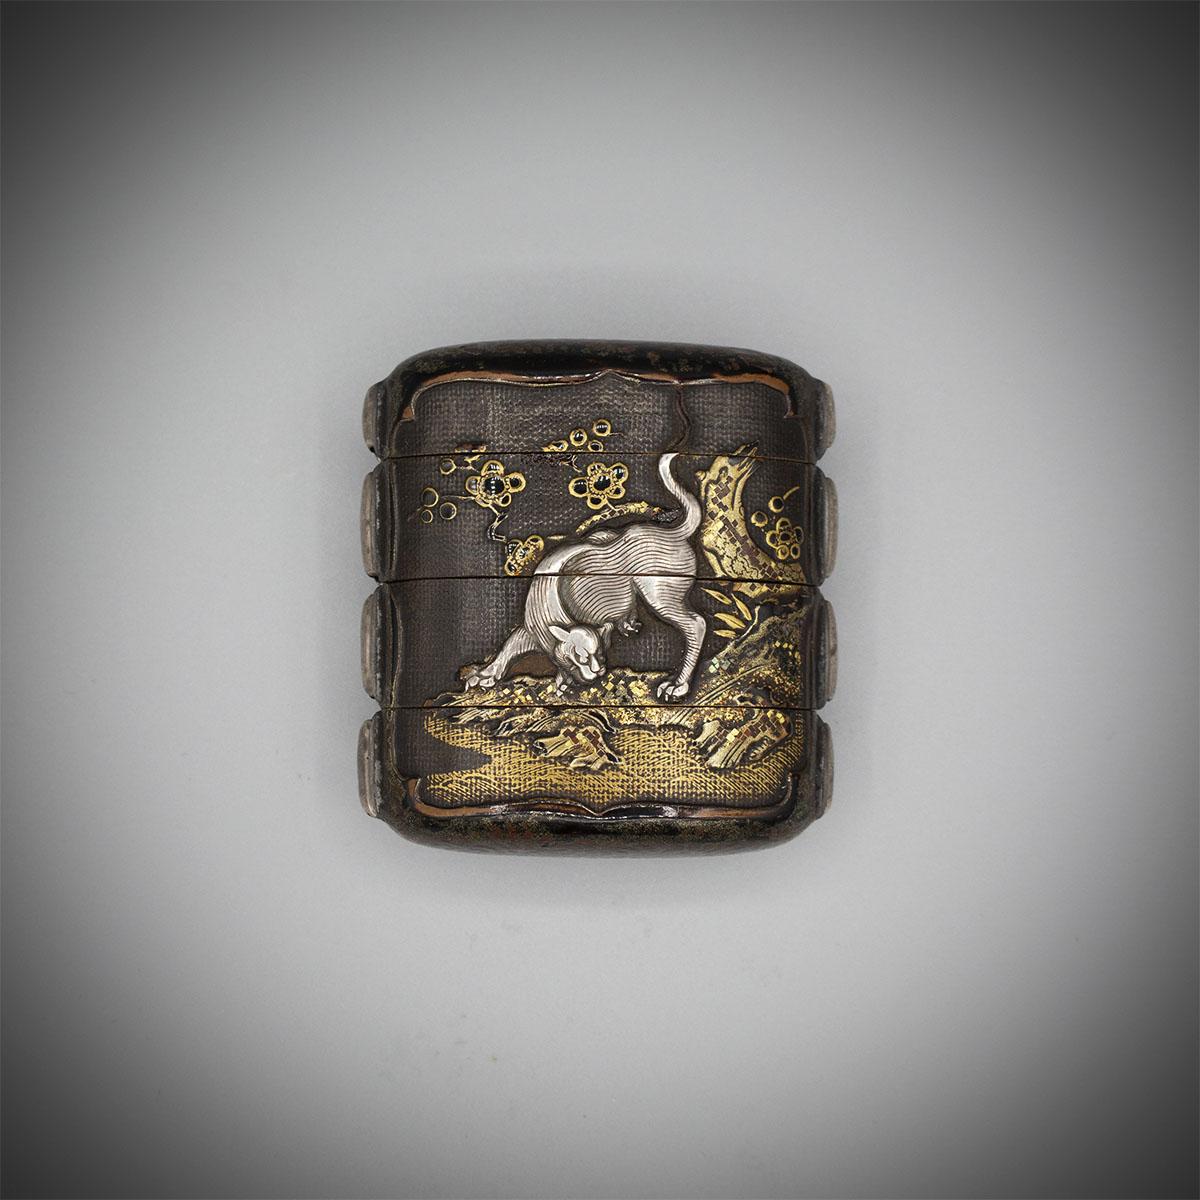 Three-case lacquer inro with silver tiger and shakudo dragon, MR3254_v1